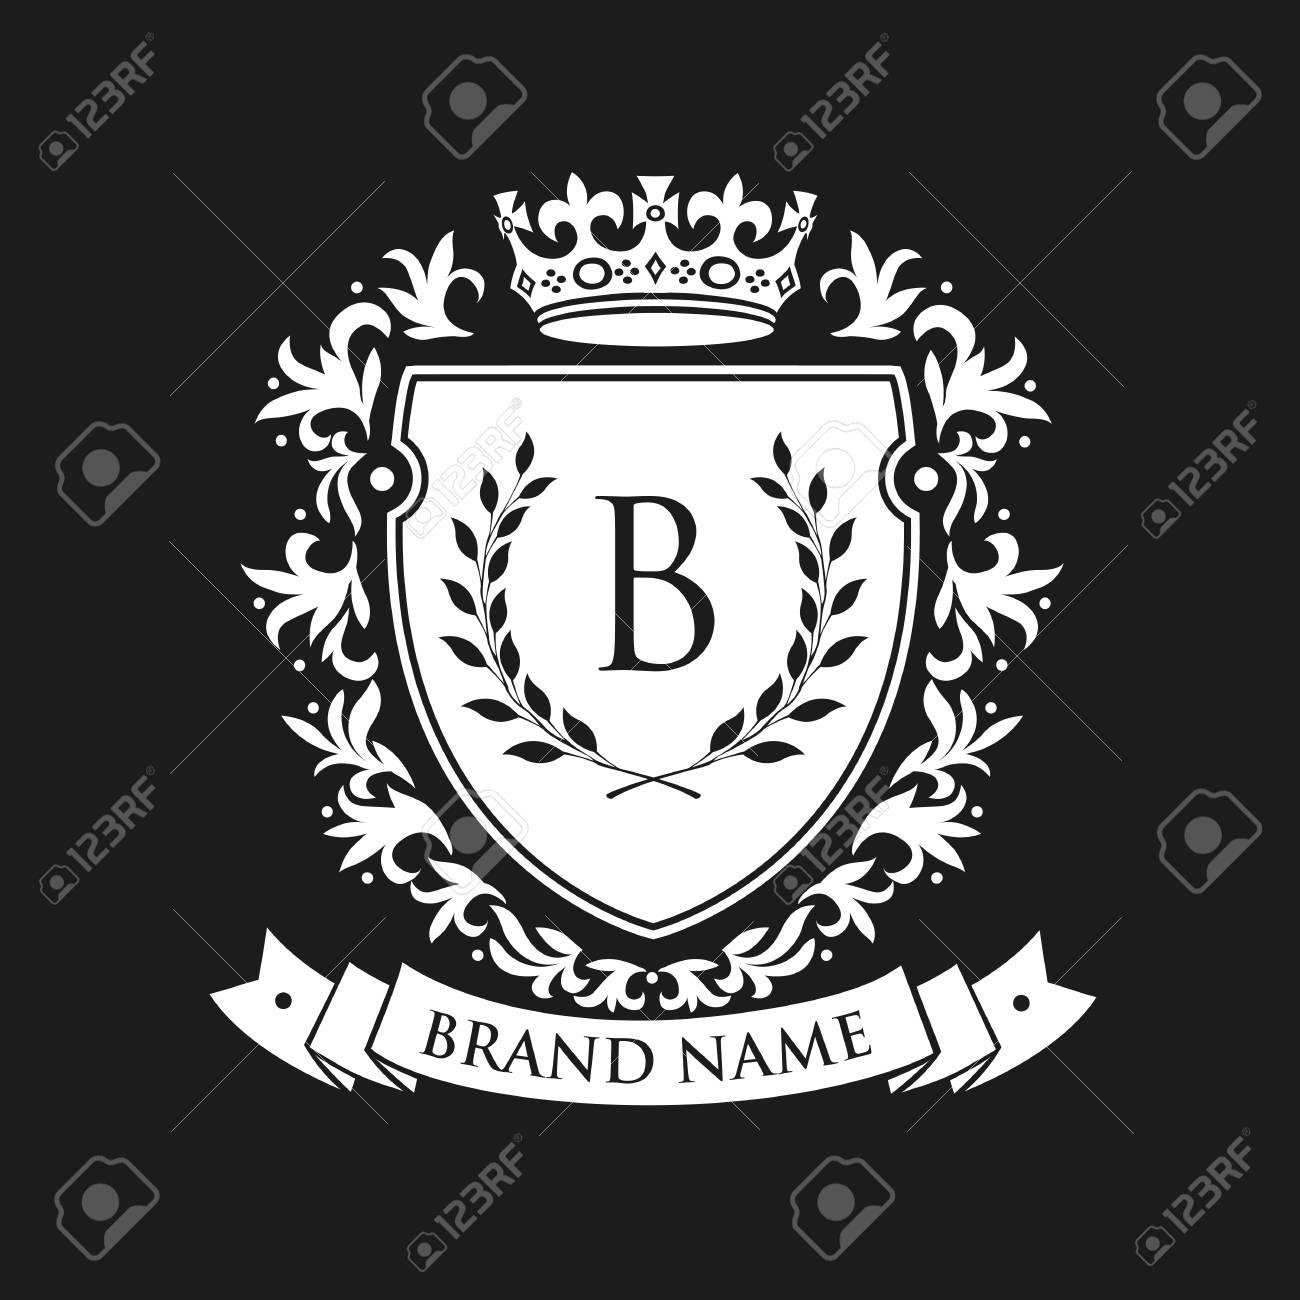 Heraldic emblem shield with crown and laurel wreath. Coat Arms Vintage Brand Crest Heraldic Emblem Shield. Vector illustration - 82116118